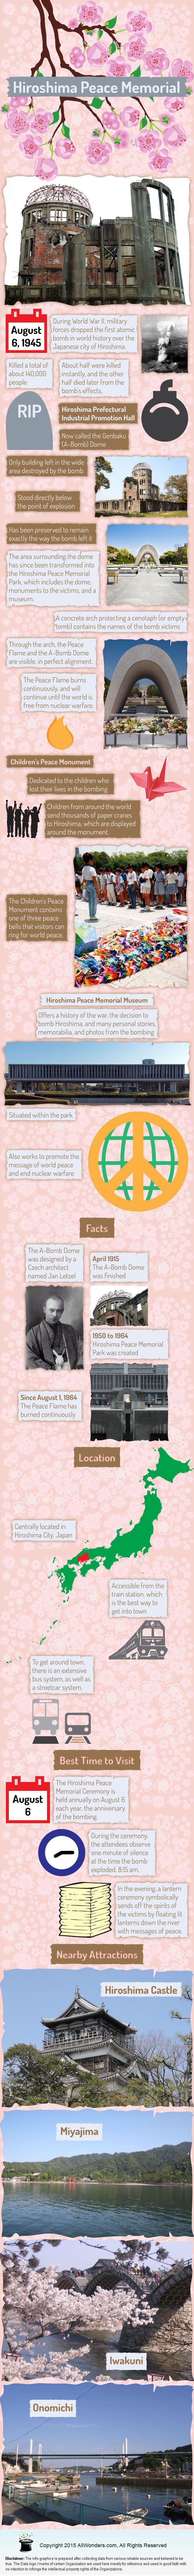 Hiroshima Peace Memorial Park Infographic